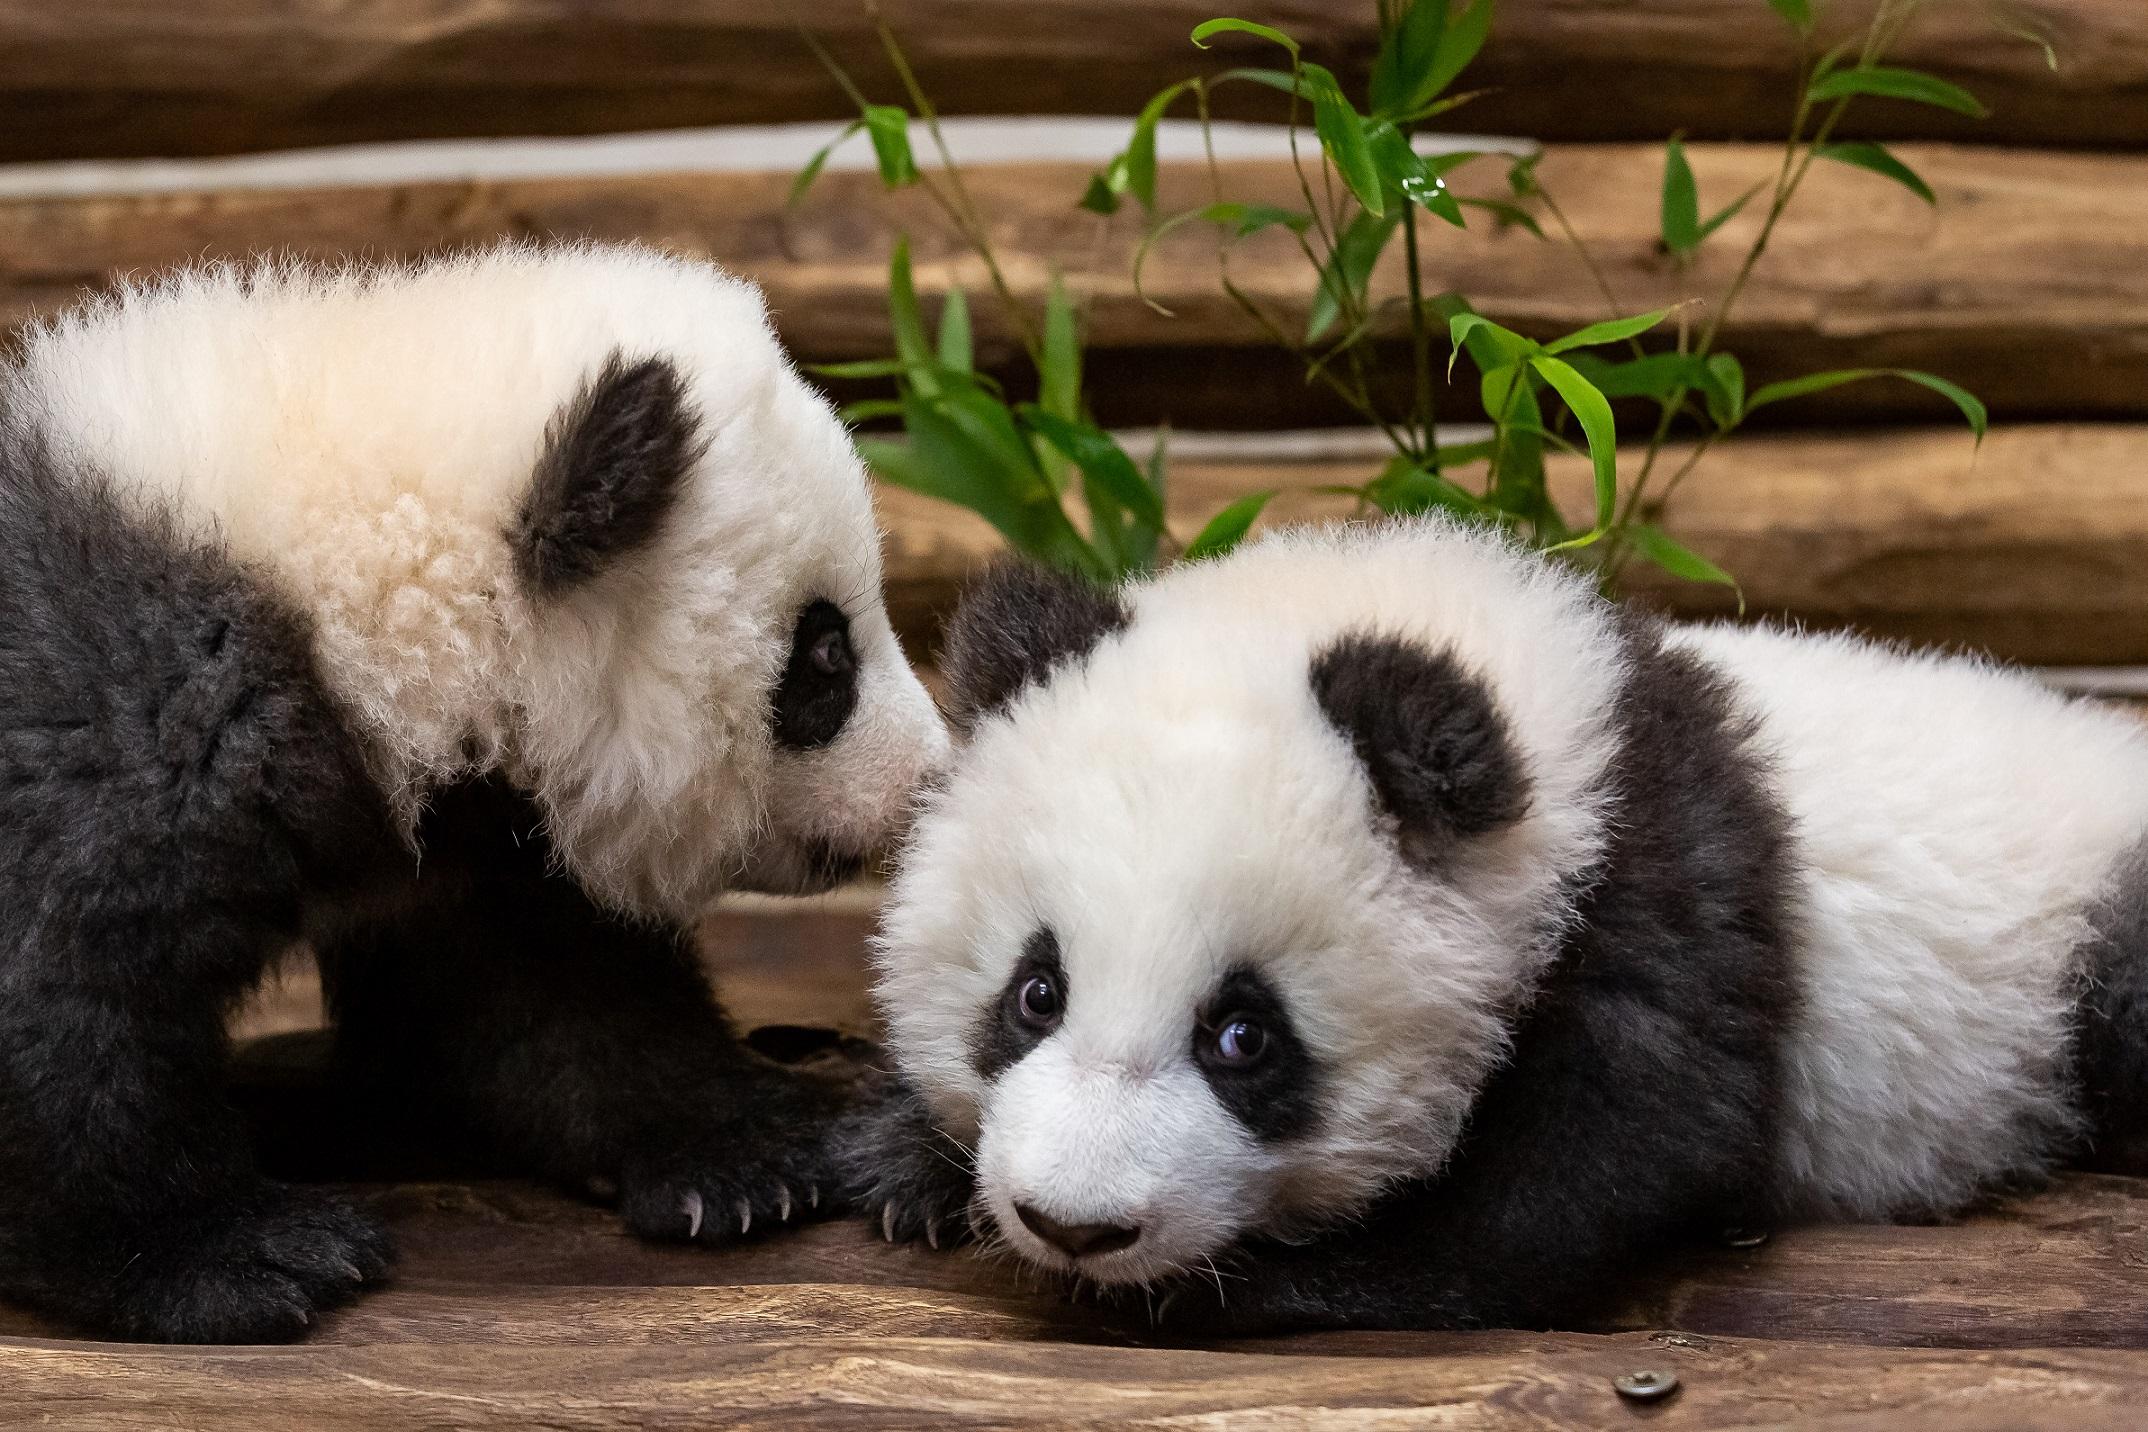 Berlin's panda cubs meet the press ahead of public debut